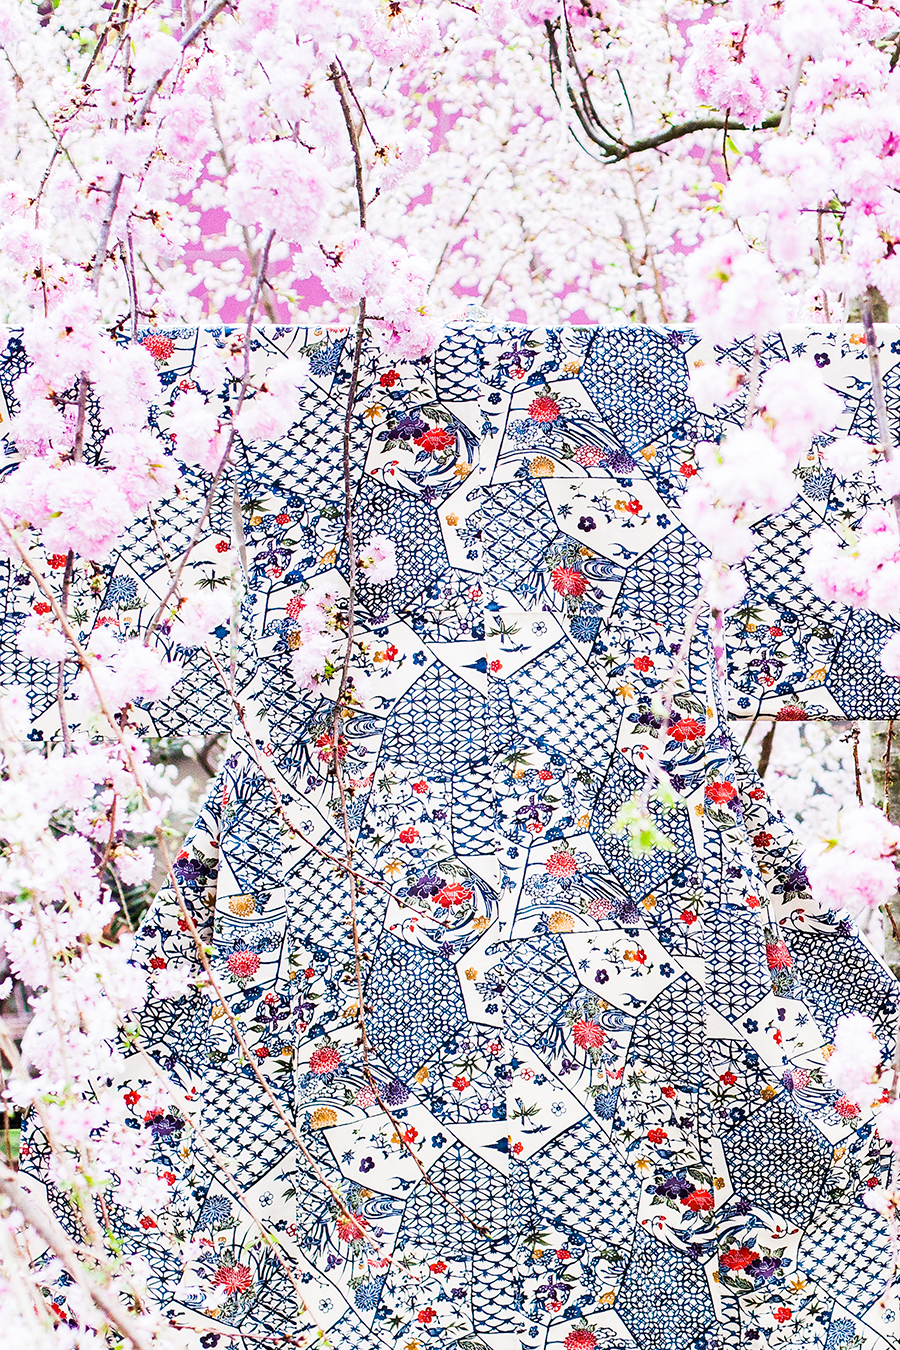 Kimono among Sakura at the Flower Dome at Gardens by the Bay, Singapore.